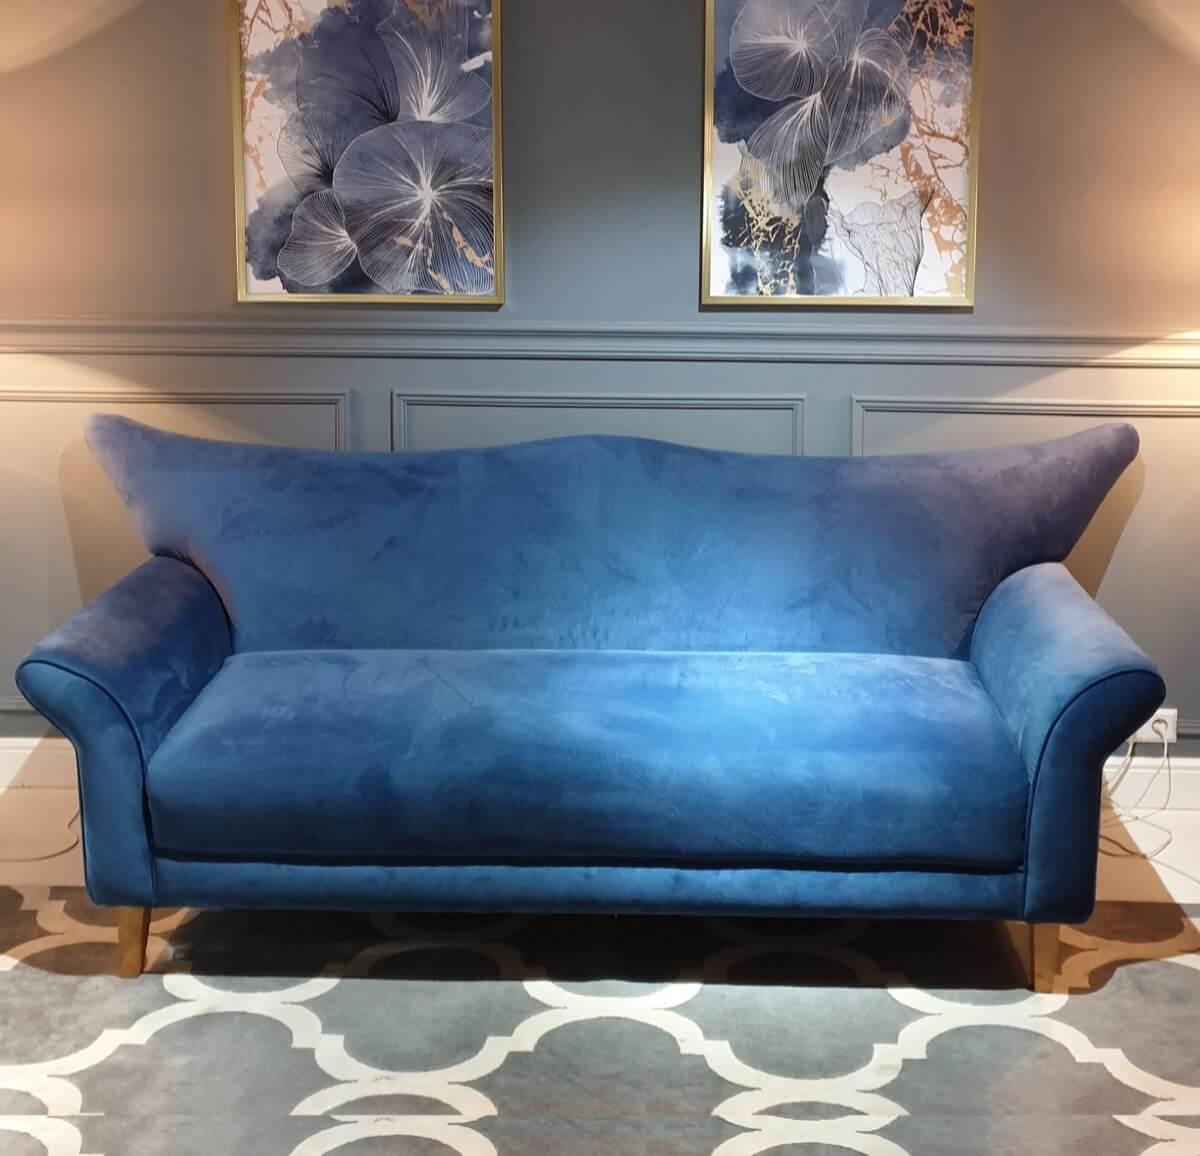 Camelback sofa in blue fabric